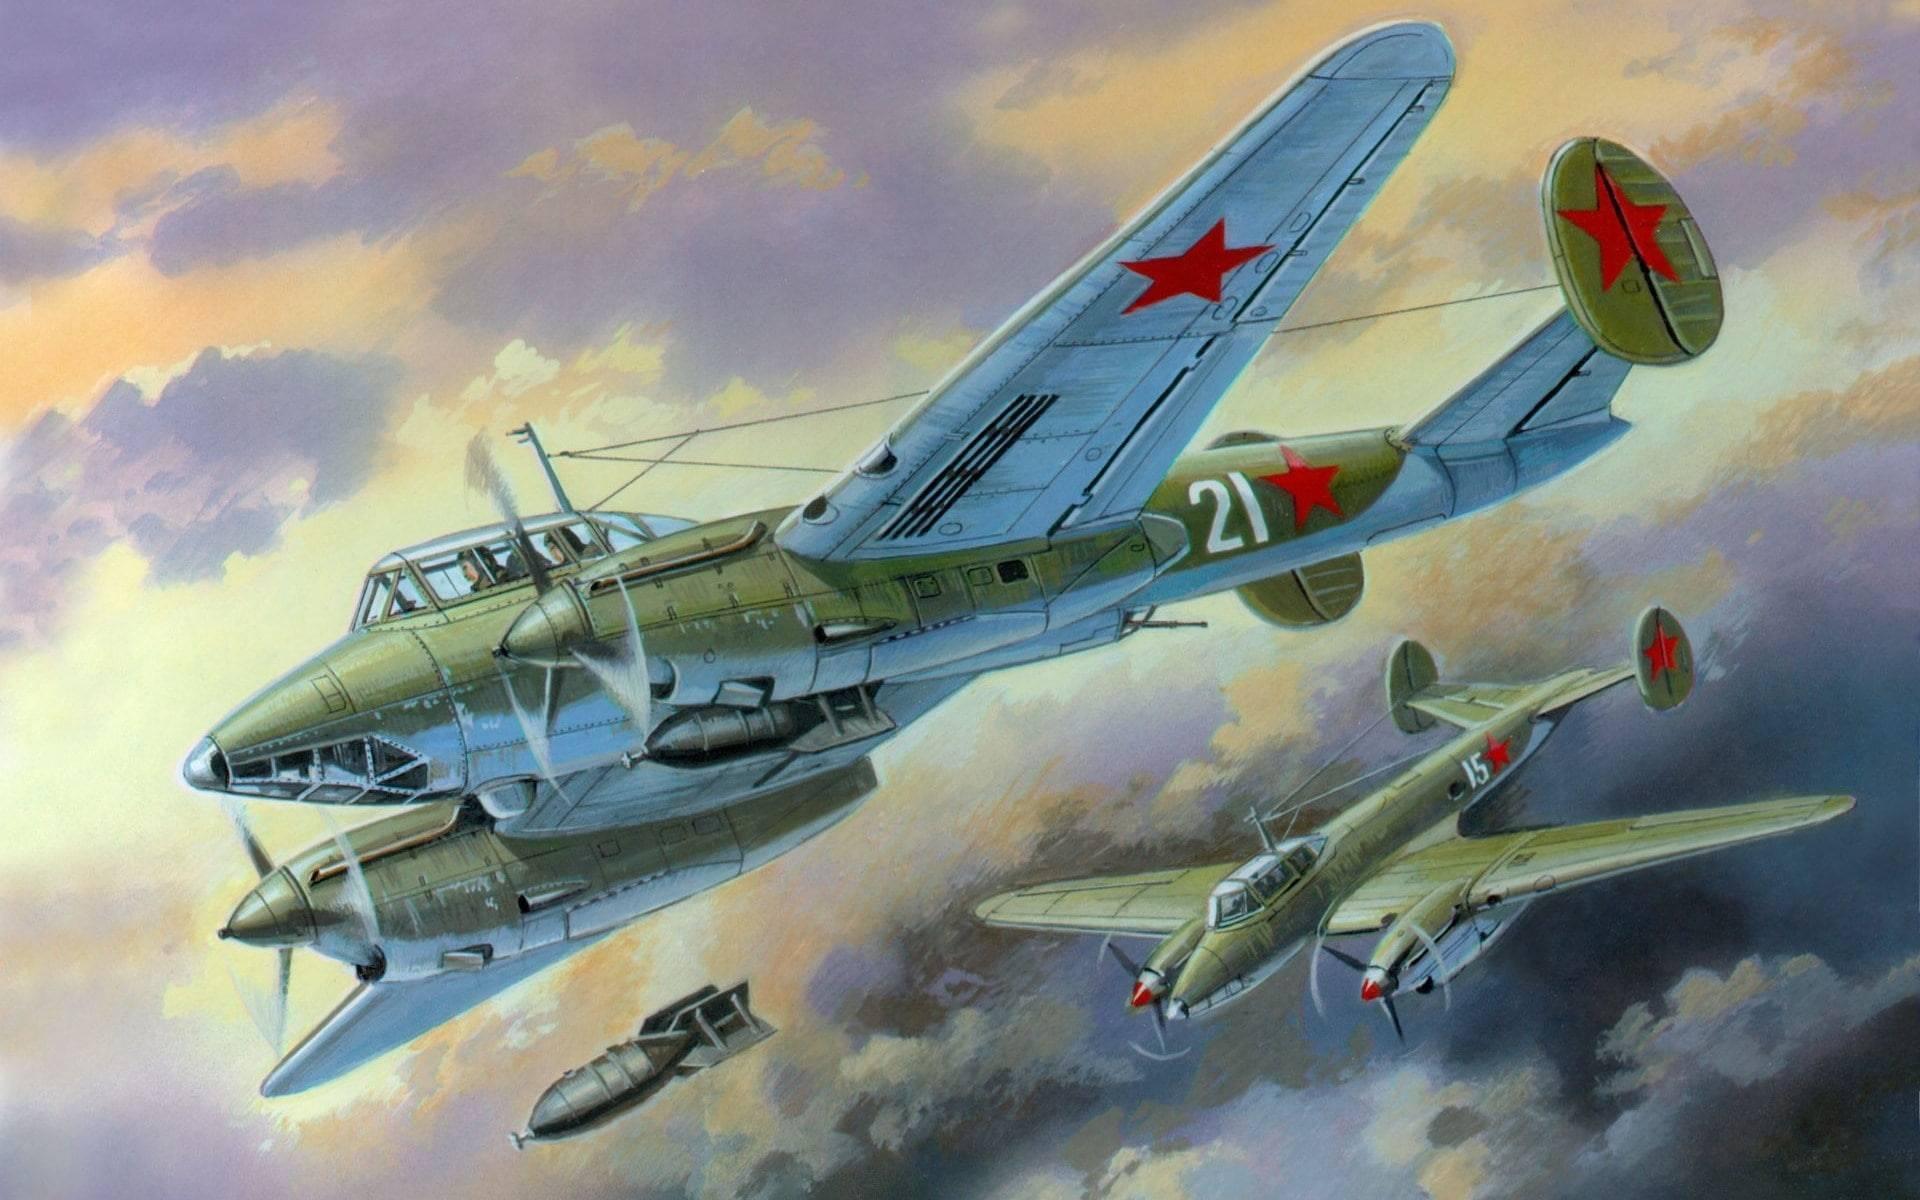 Ар-2 - arkhangelsky ar-2 - qwe.wiki